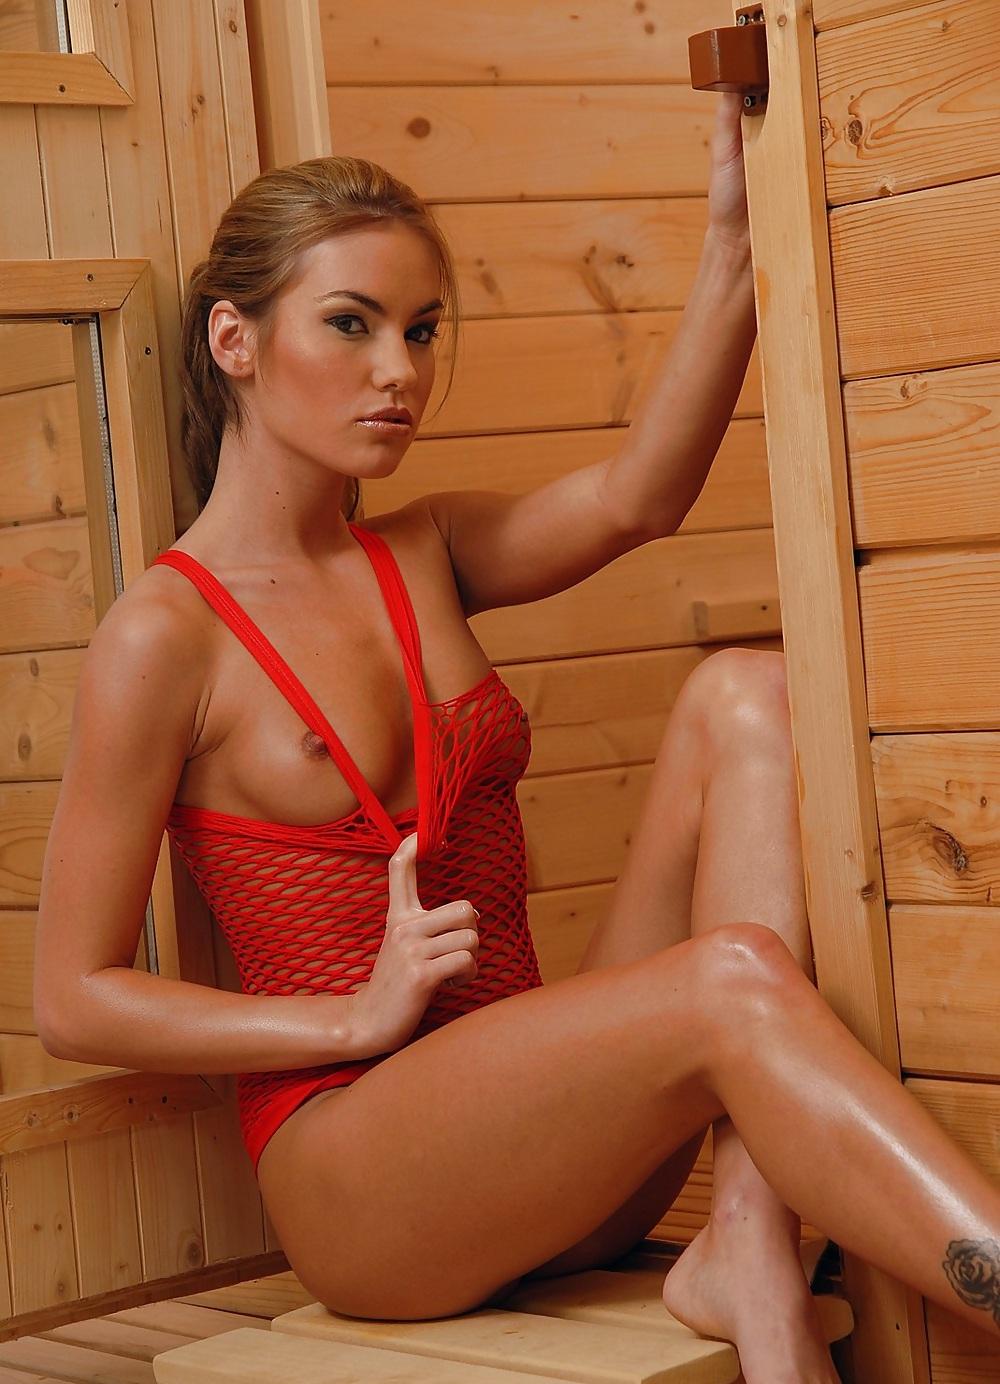 Hooker sauna and hot tubs gfe escort review ecg global partners